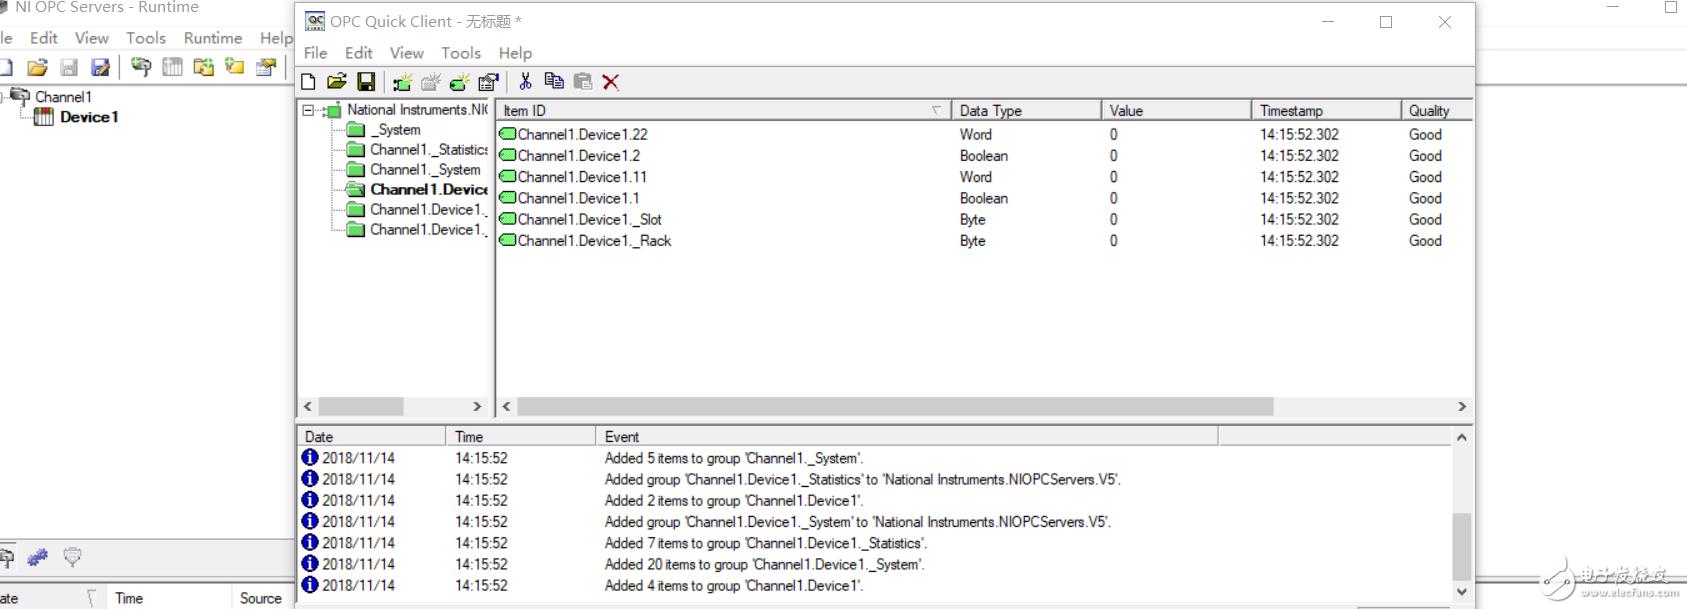 labview2018用OPC Server 2016与S7-1200通讯,S7-1200使用的是仿真软件S7-PLCSIM V14,quality显示good但是value值没与PLC同步?